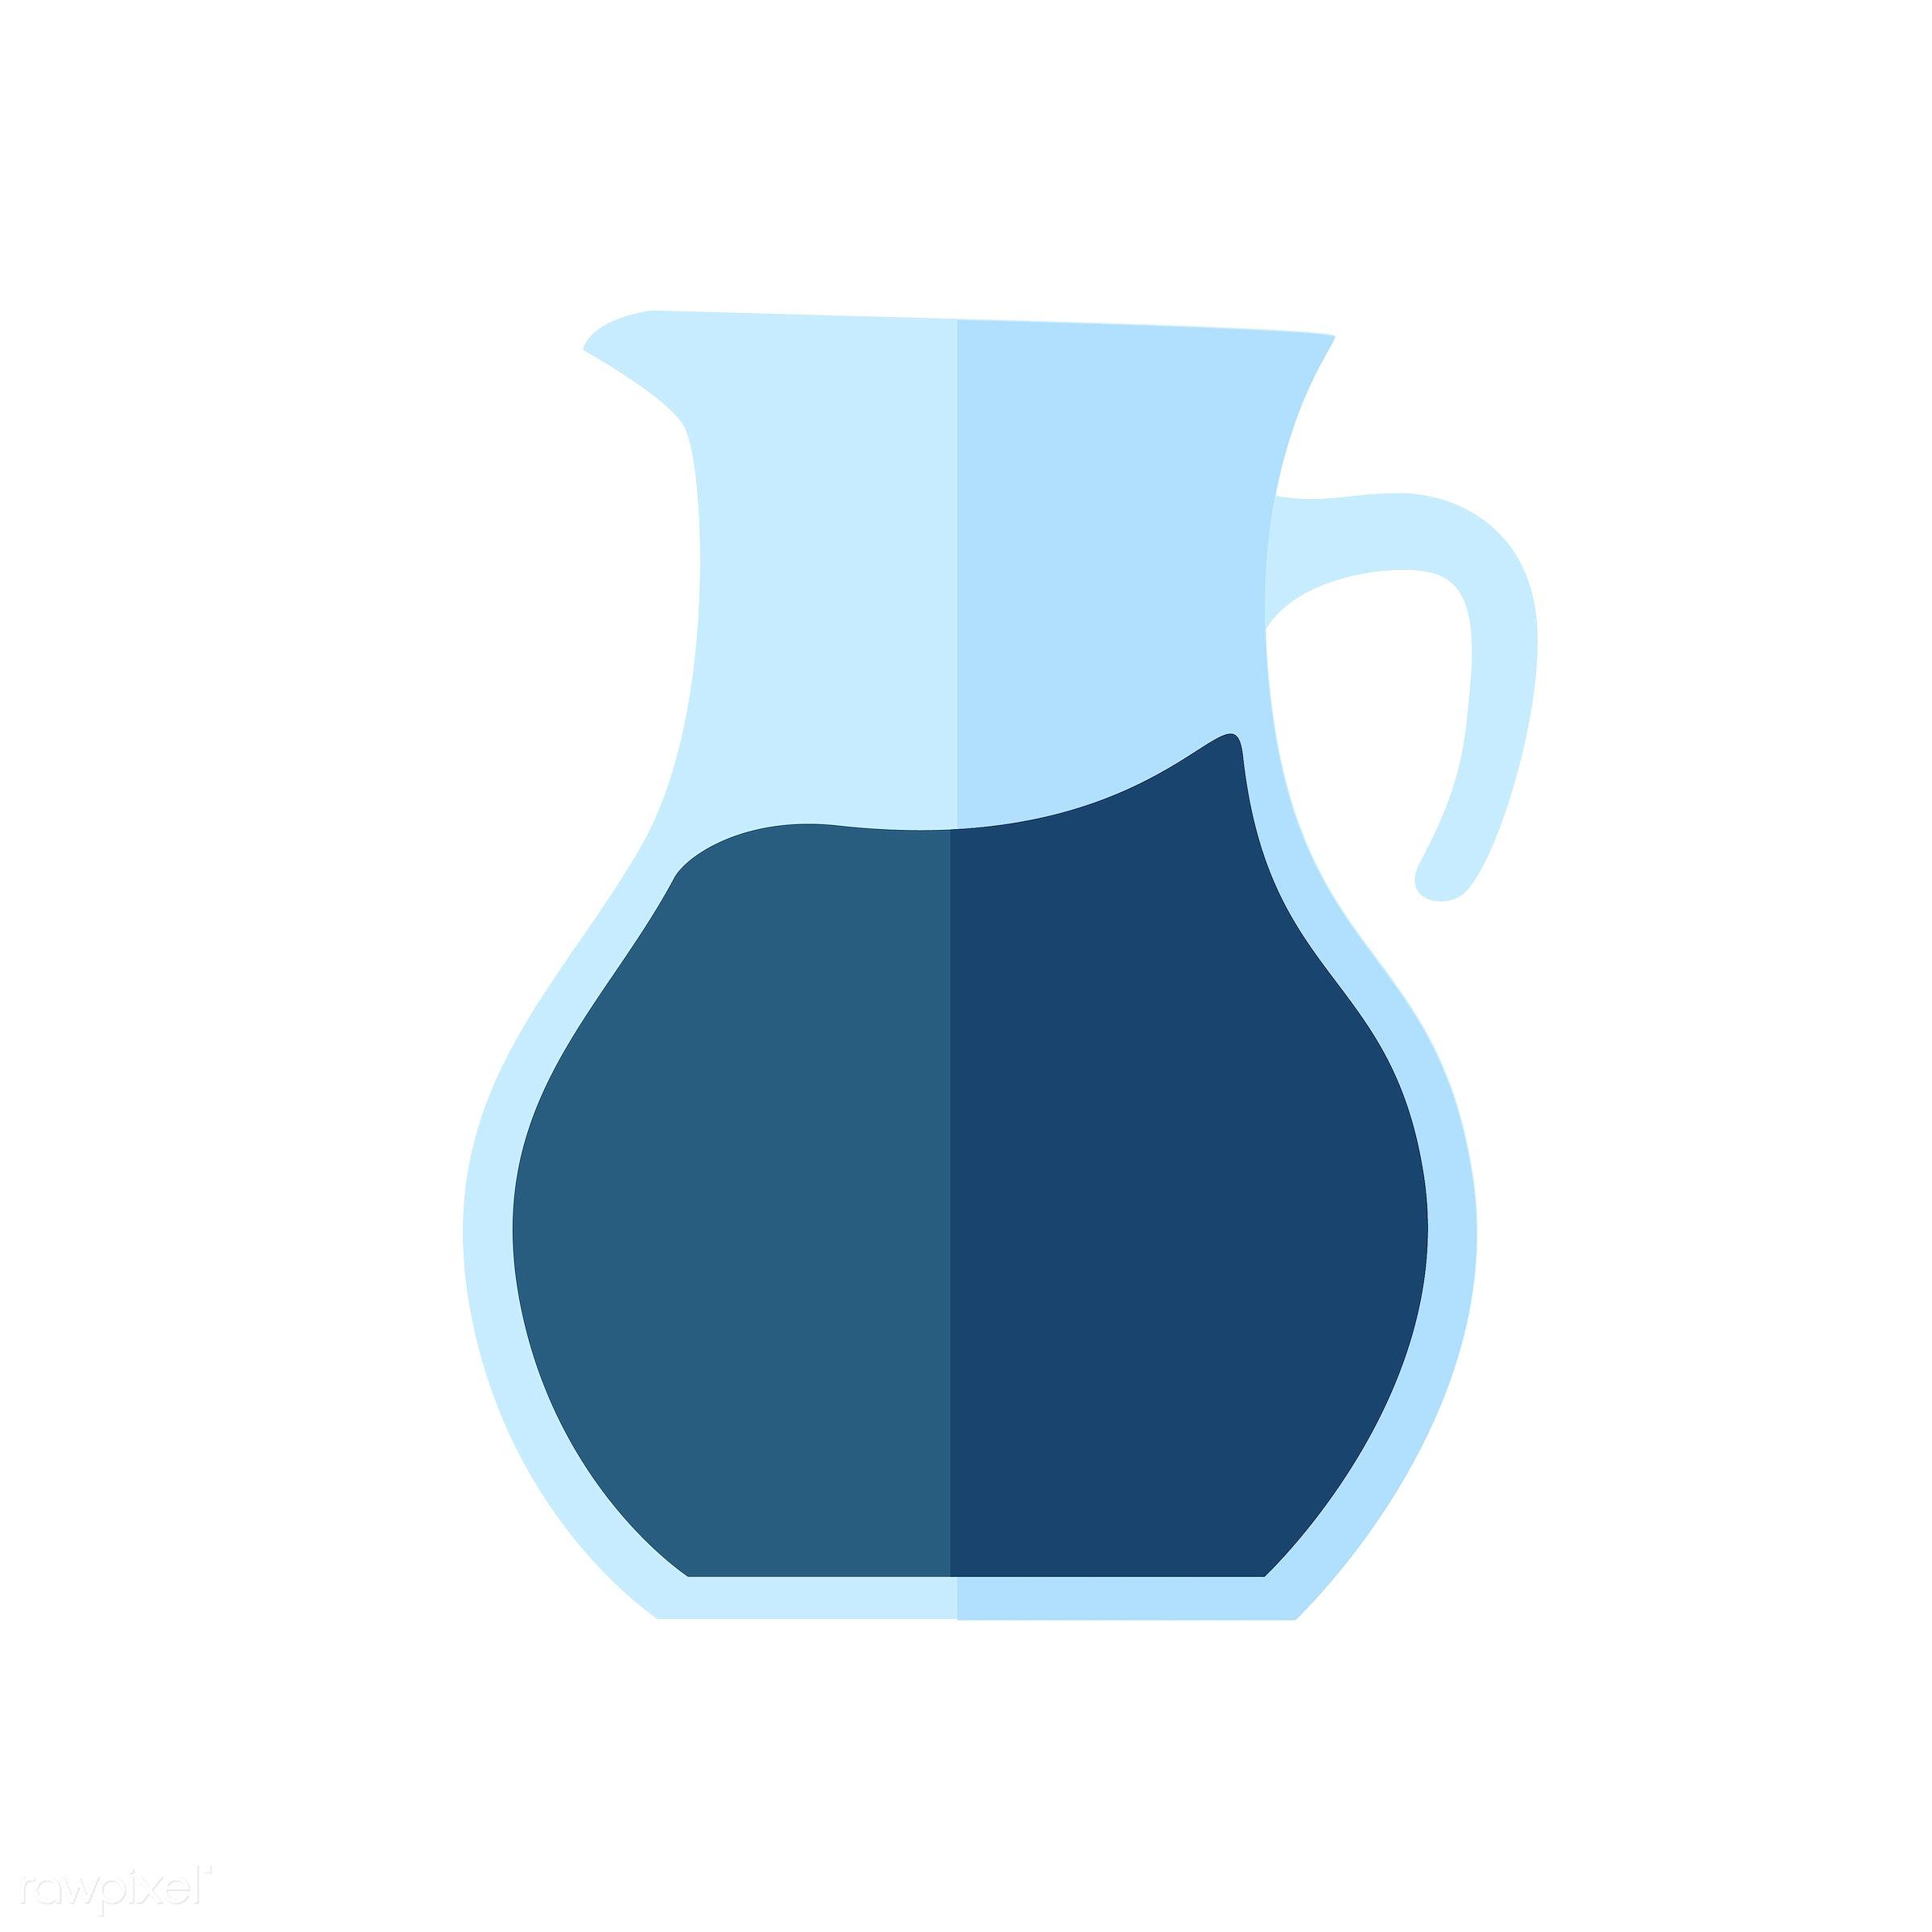 vector, graphic, illustration, icon, symbol, colorful, cute, drink, beverage, water, blue, jug, lemonade